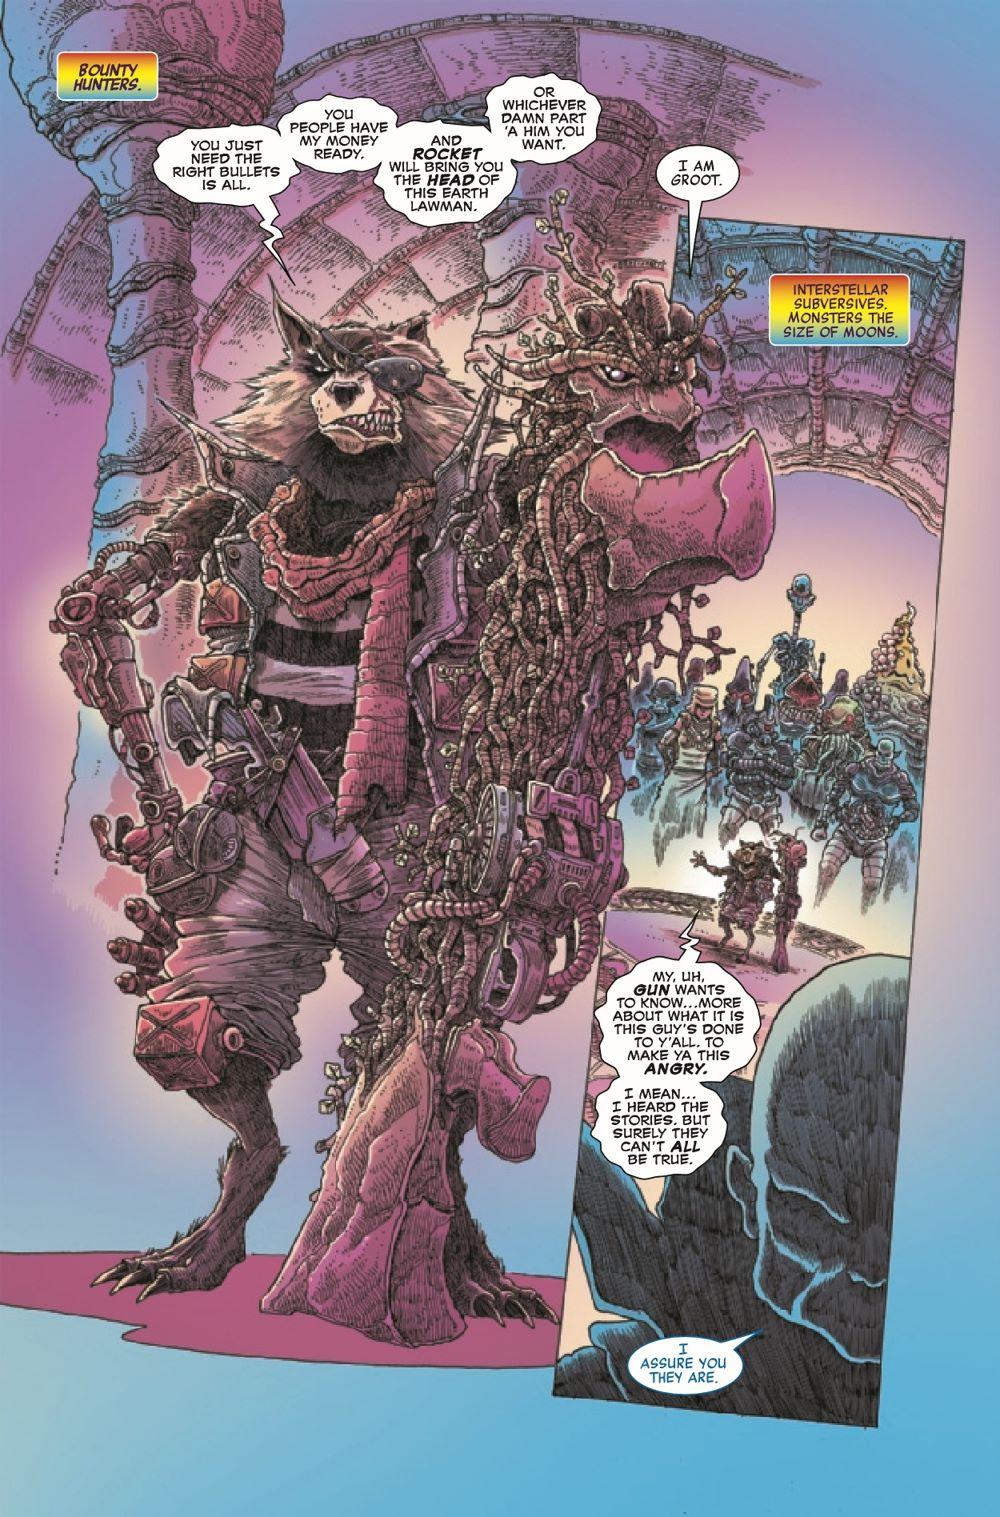 HEROESREBORN2021004_Preview-4 ComicList Previews: HEROES REBORN #4 (OF 7)